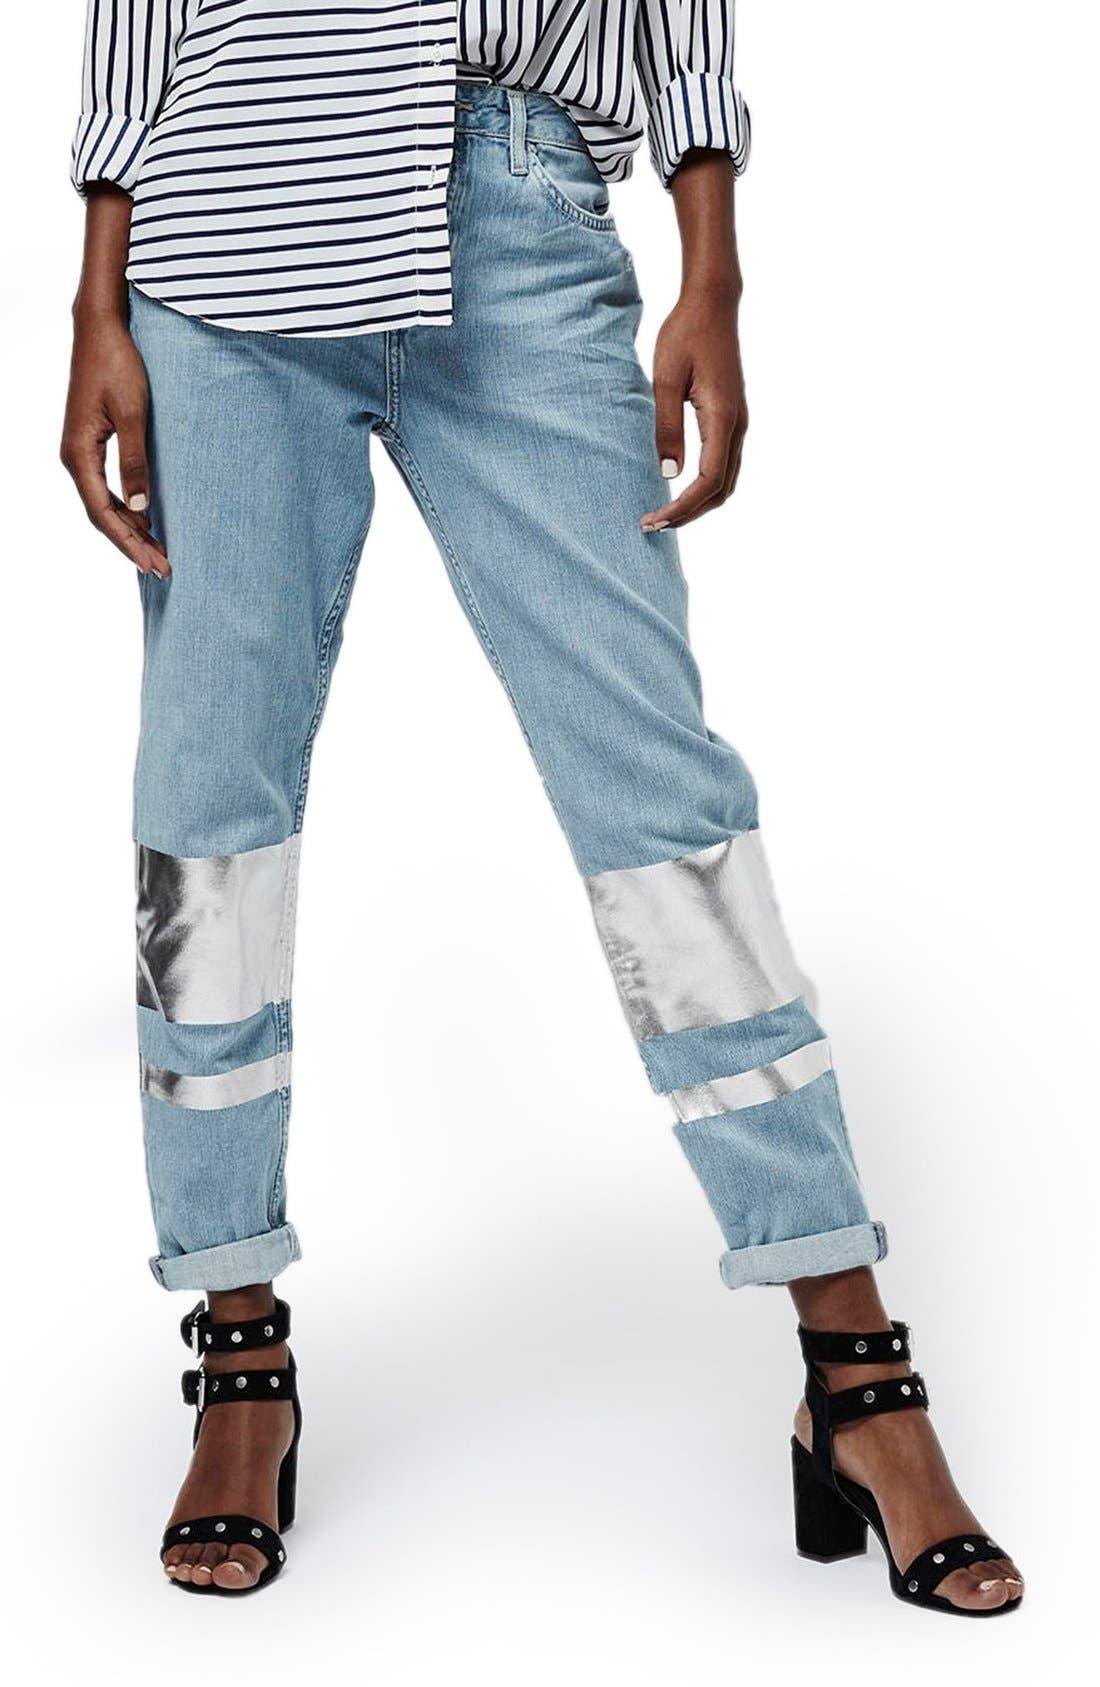 Alternate Image 1 Selected - Topshop Silver Stripe Hologram Crop Boyfriend Jeans (Light)